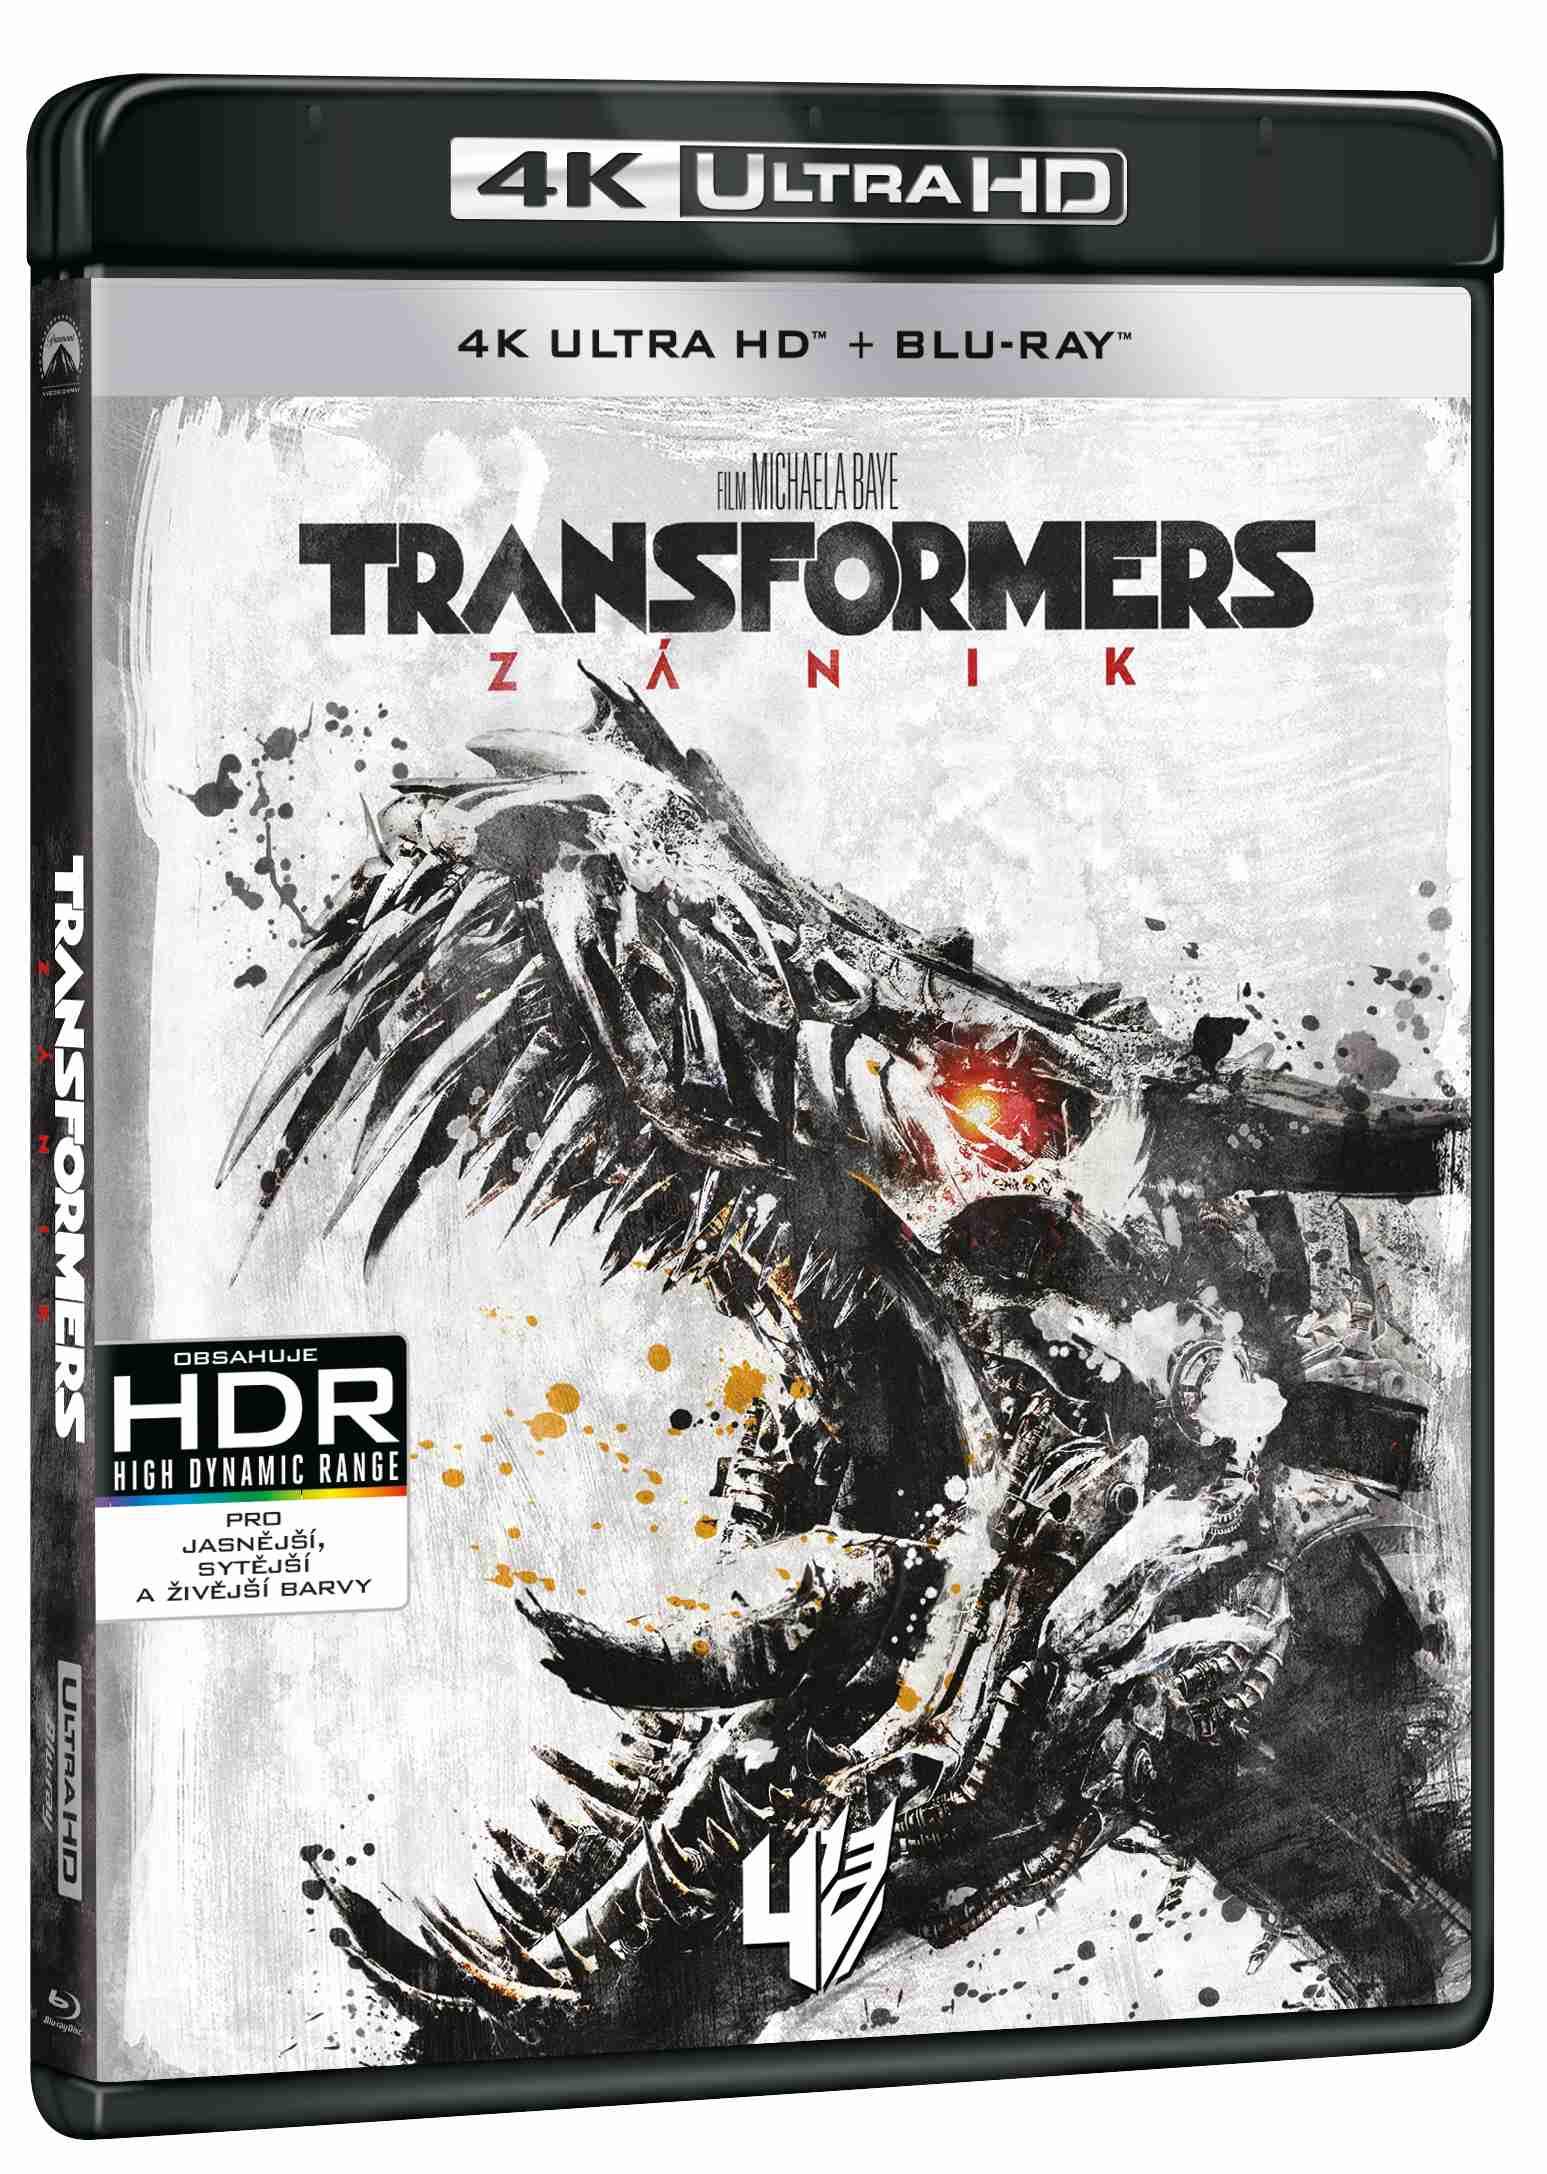 TRANSFORMERS: ZÁNIK (4K ULTRA HD) - UHD Blu-ray + Blu-ray (2 BD)